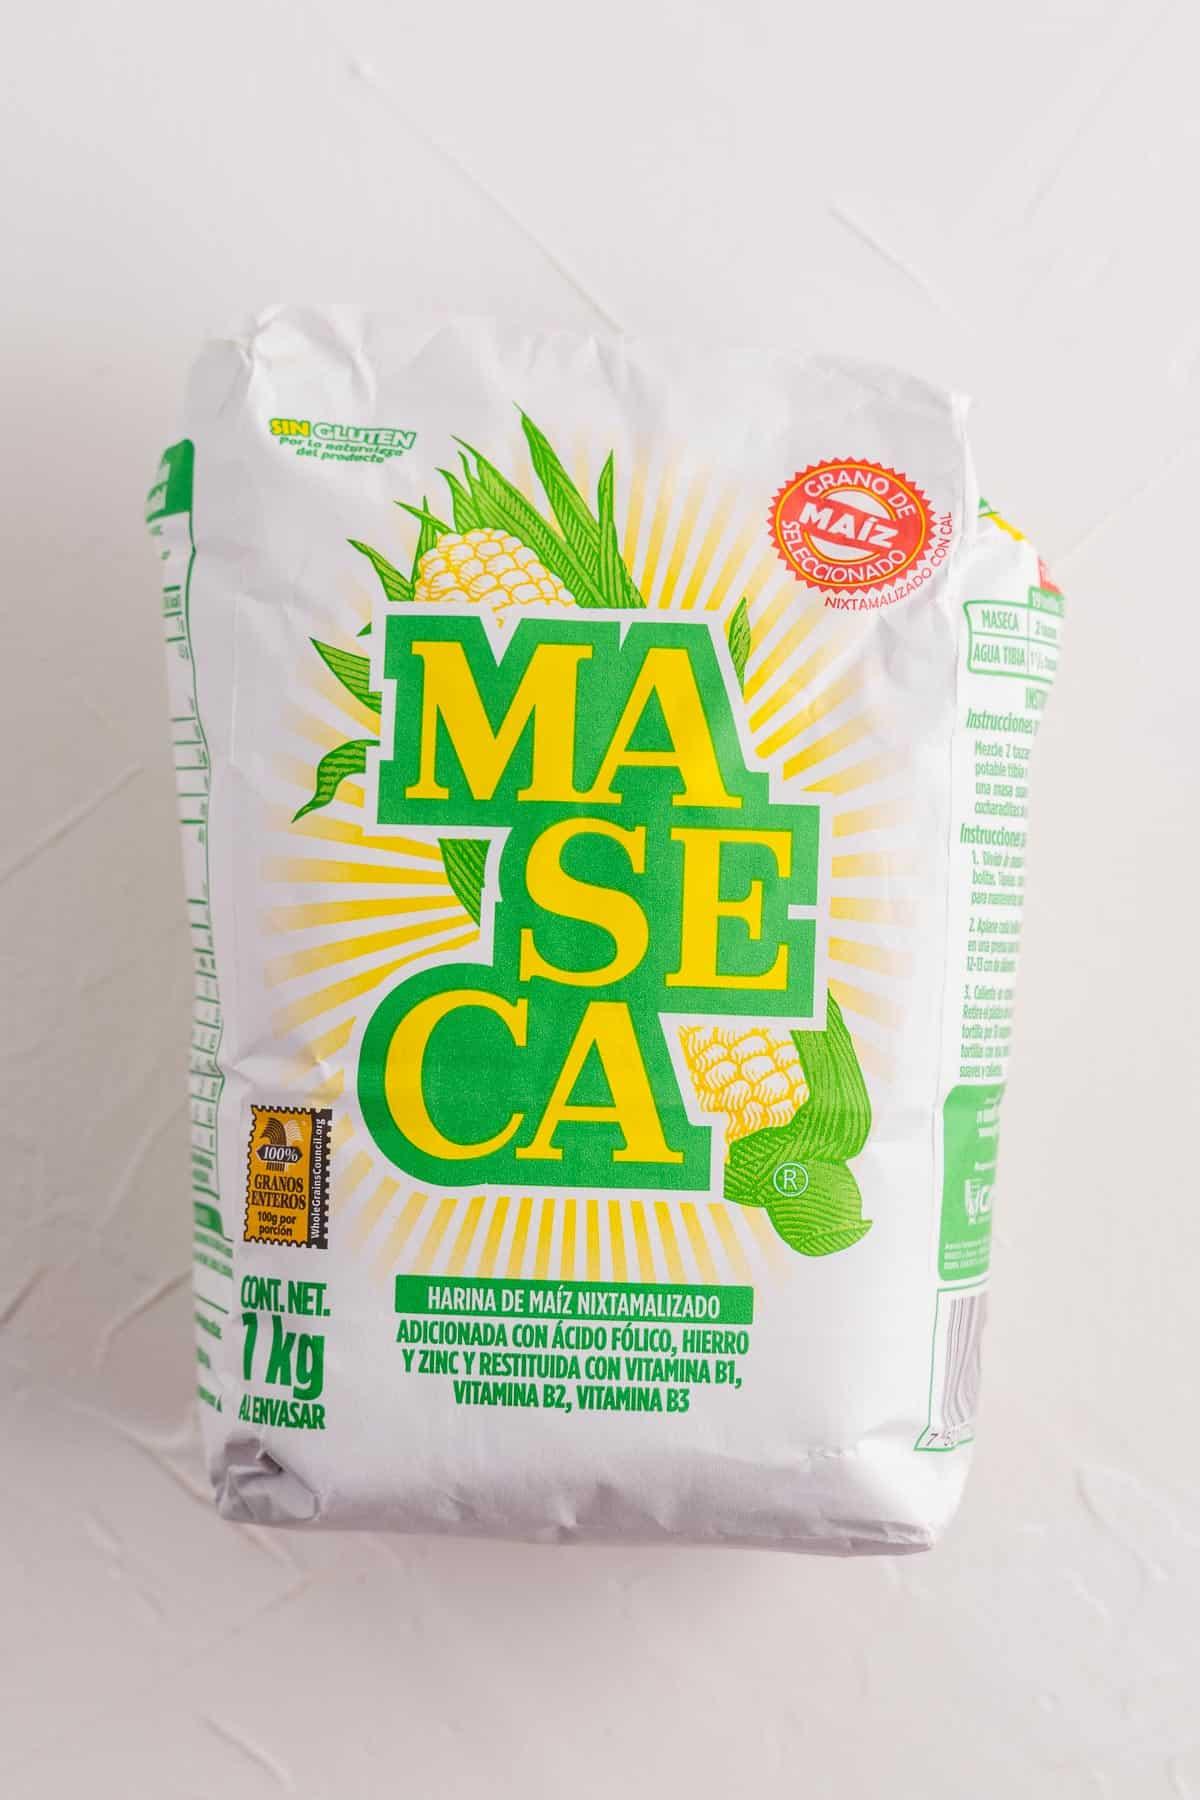 Maseca Bag